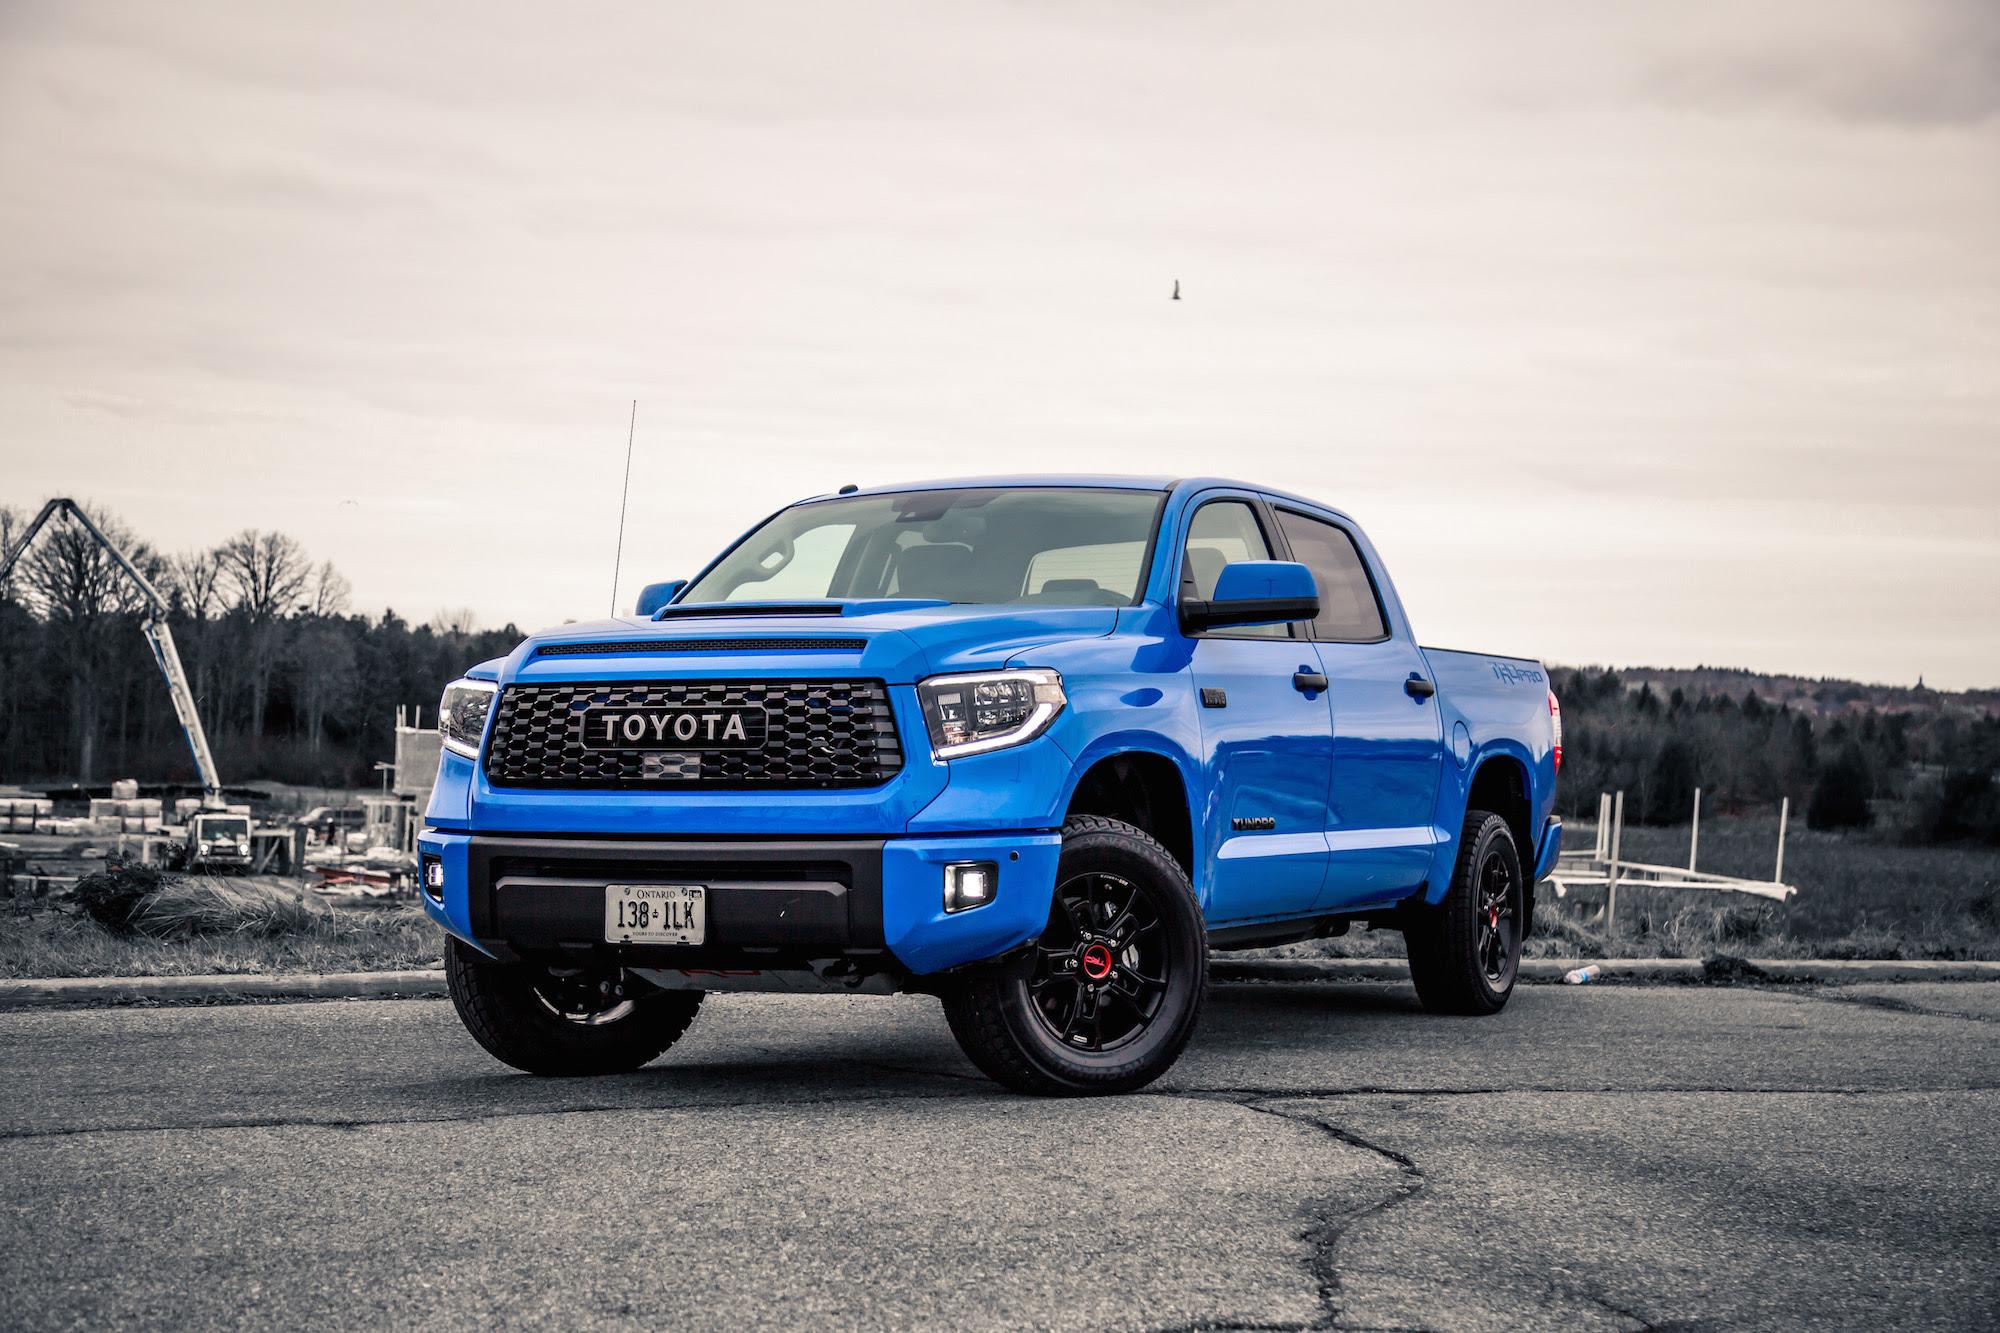 Toyota Voodoo Blue